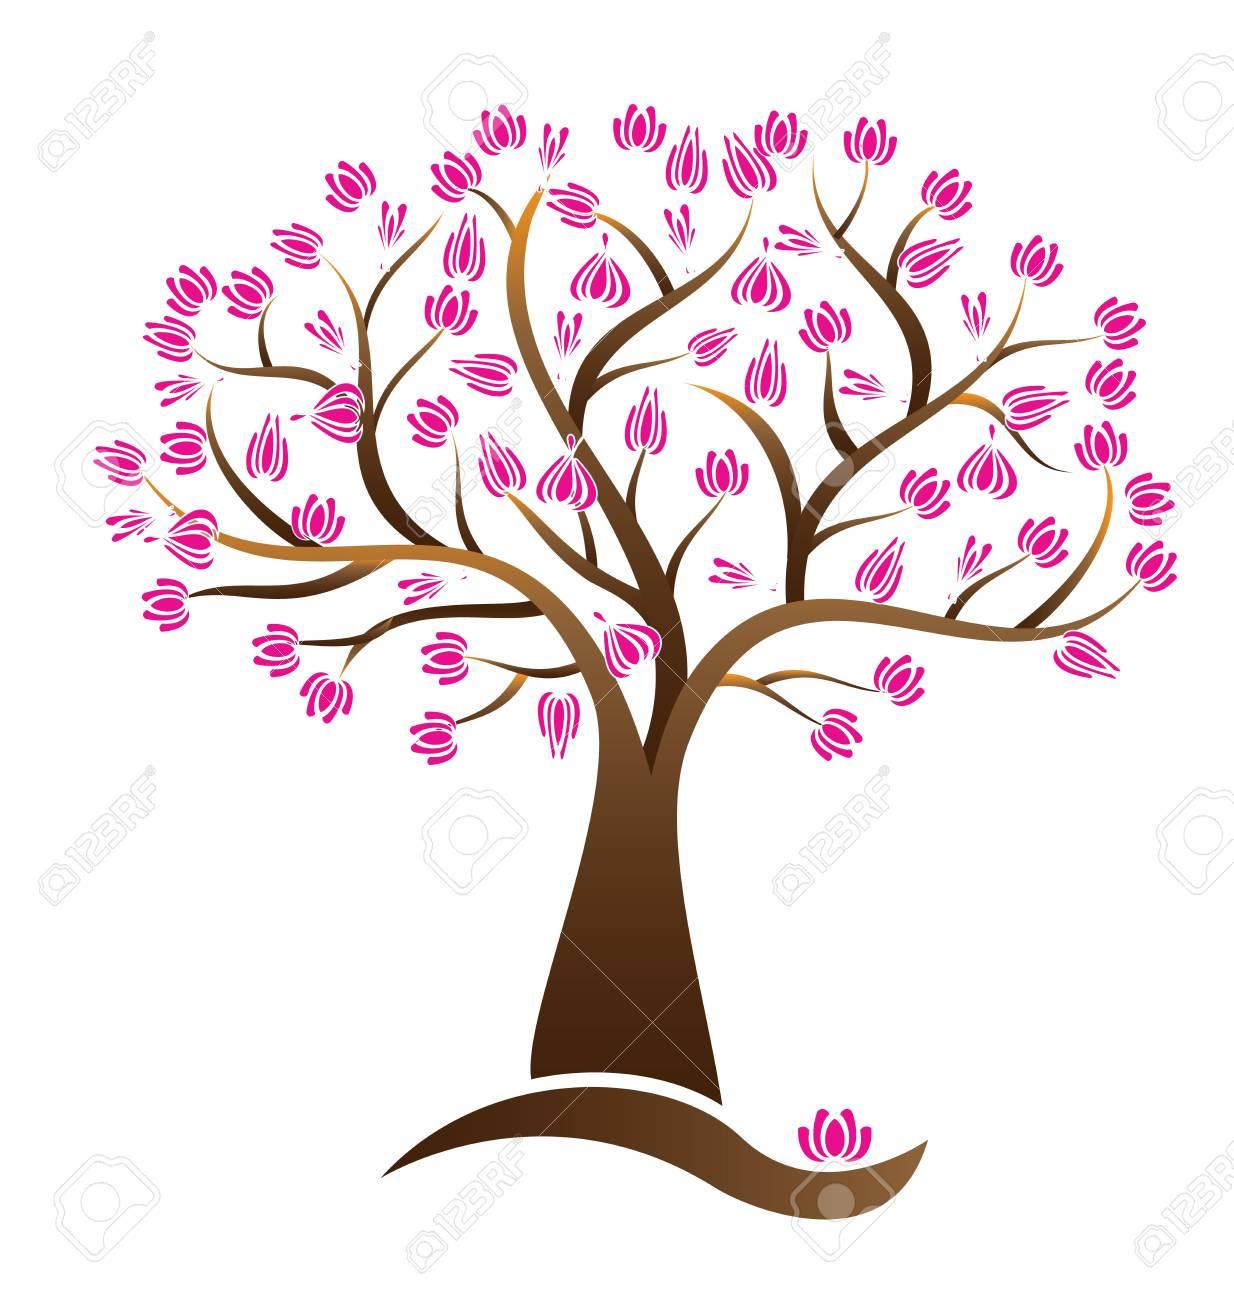 Cherry lotus blossom tree vector logo image royalty free cliparts cherry lotus blossom tree vector logo image stock vector 97786978 izmirmasajfo